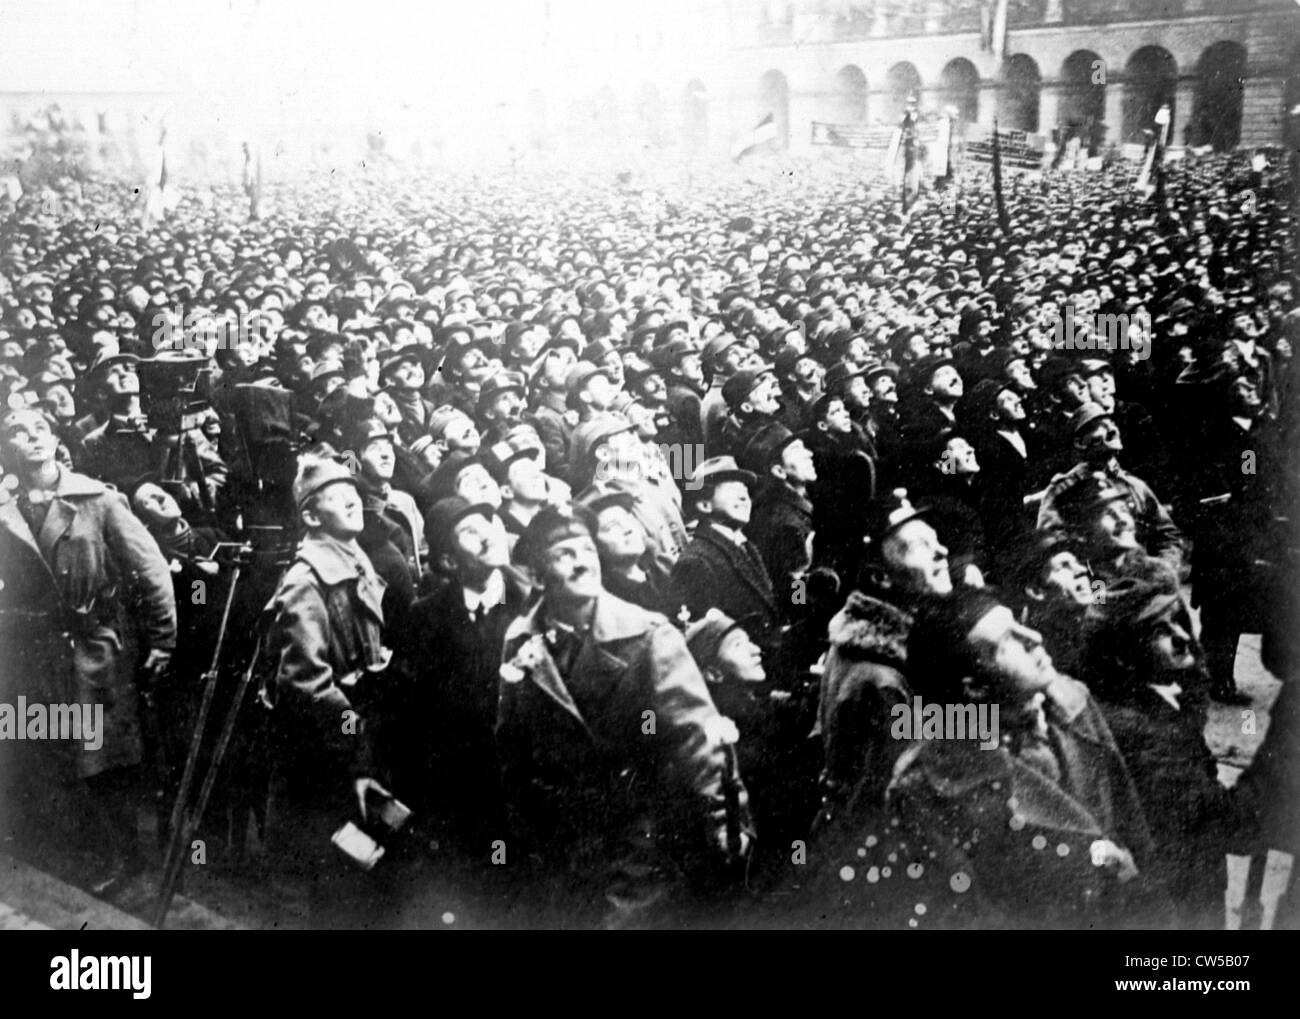 Budapest, Revolutionary demonstration, 1919 - Stock Image